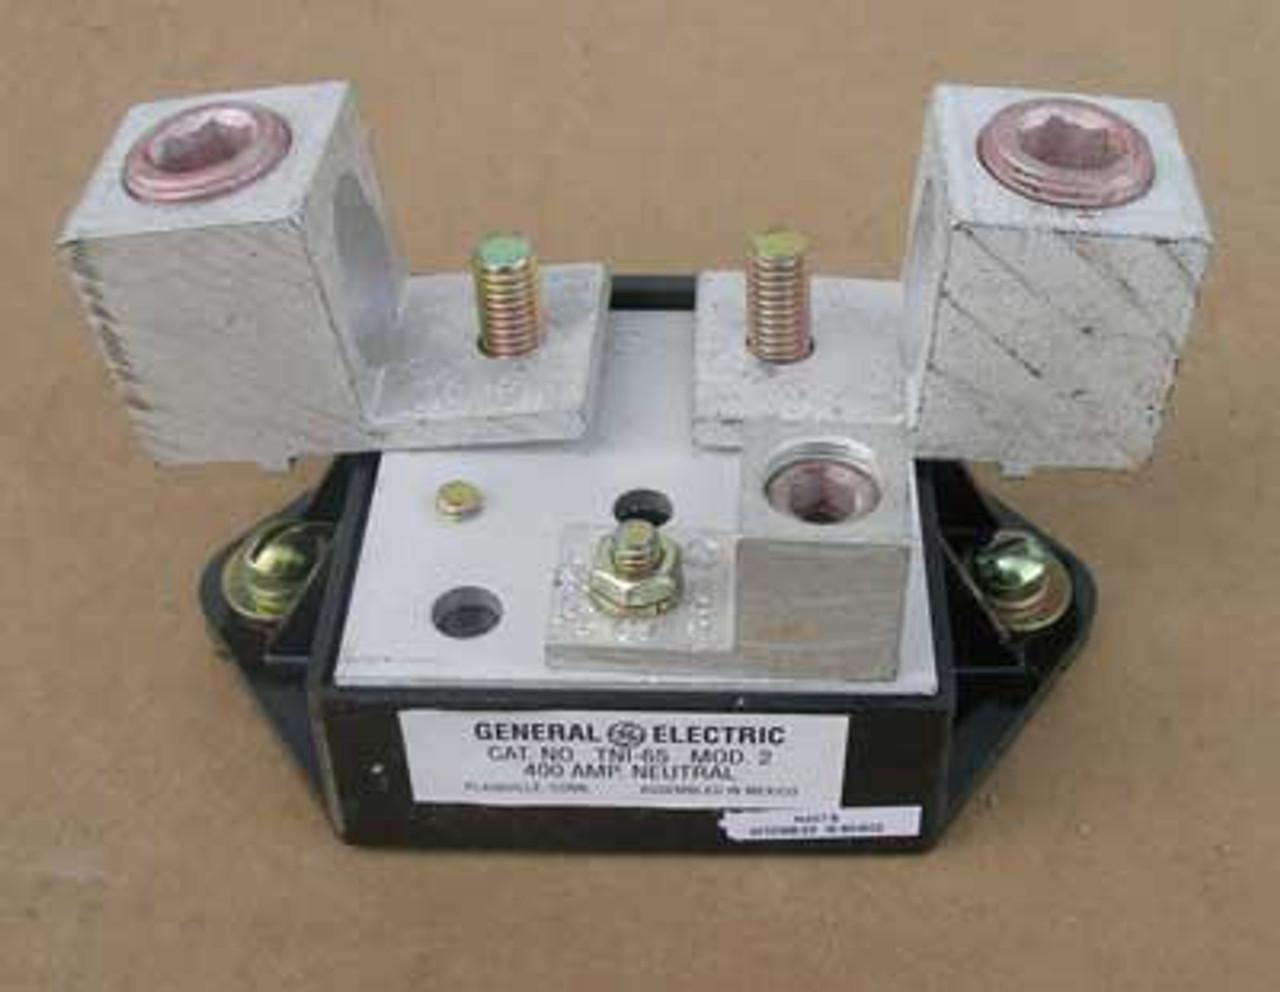 GE Insulated Groundable Neutrals TNI65 400 Amp 600V